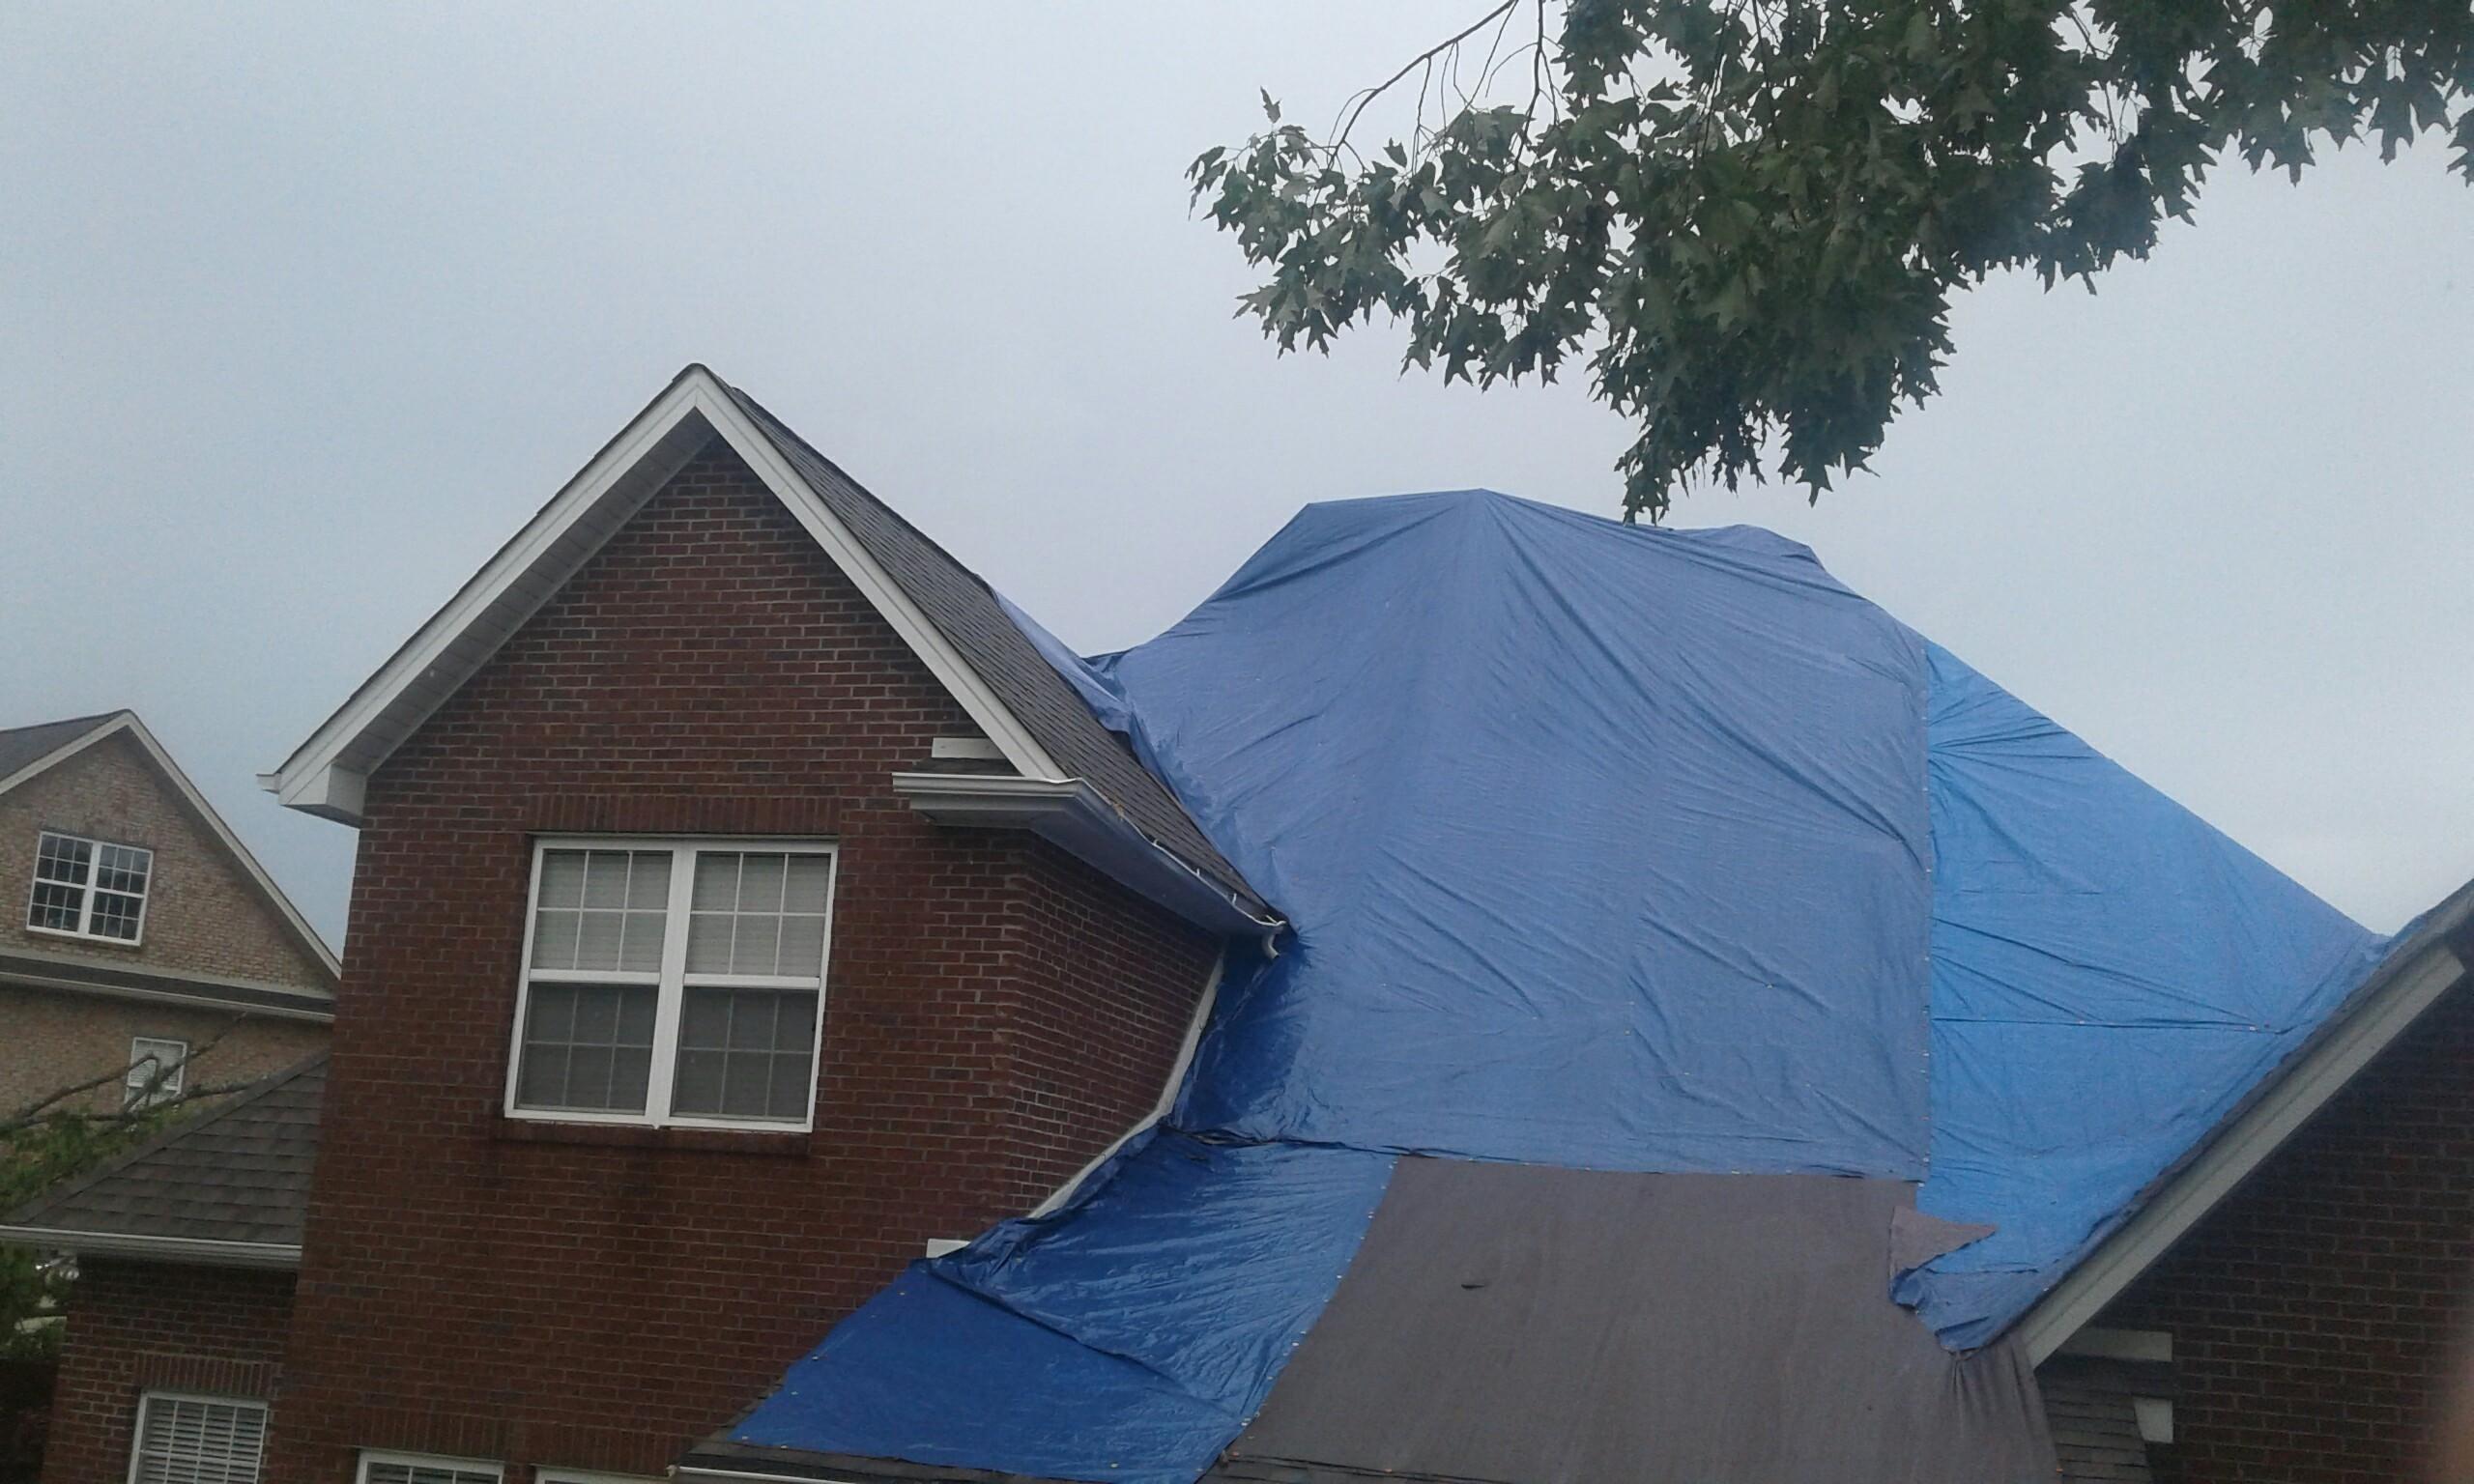 Storm damage Knoxville TN - Burell Built Exteriors & Roofing Company, LLC